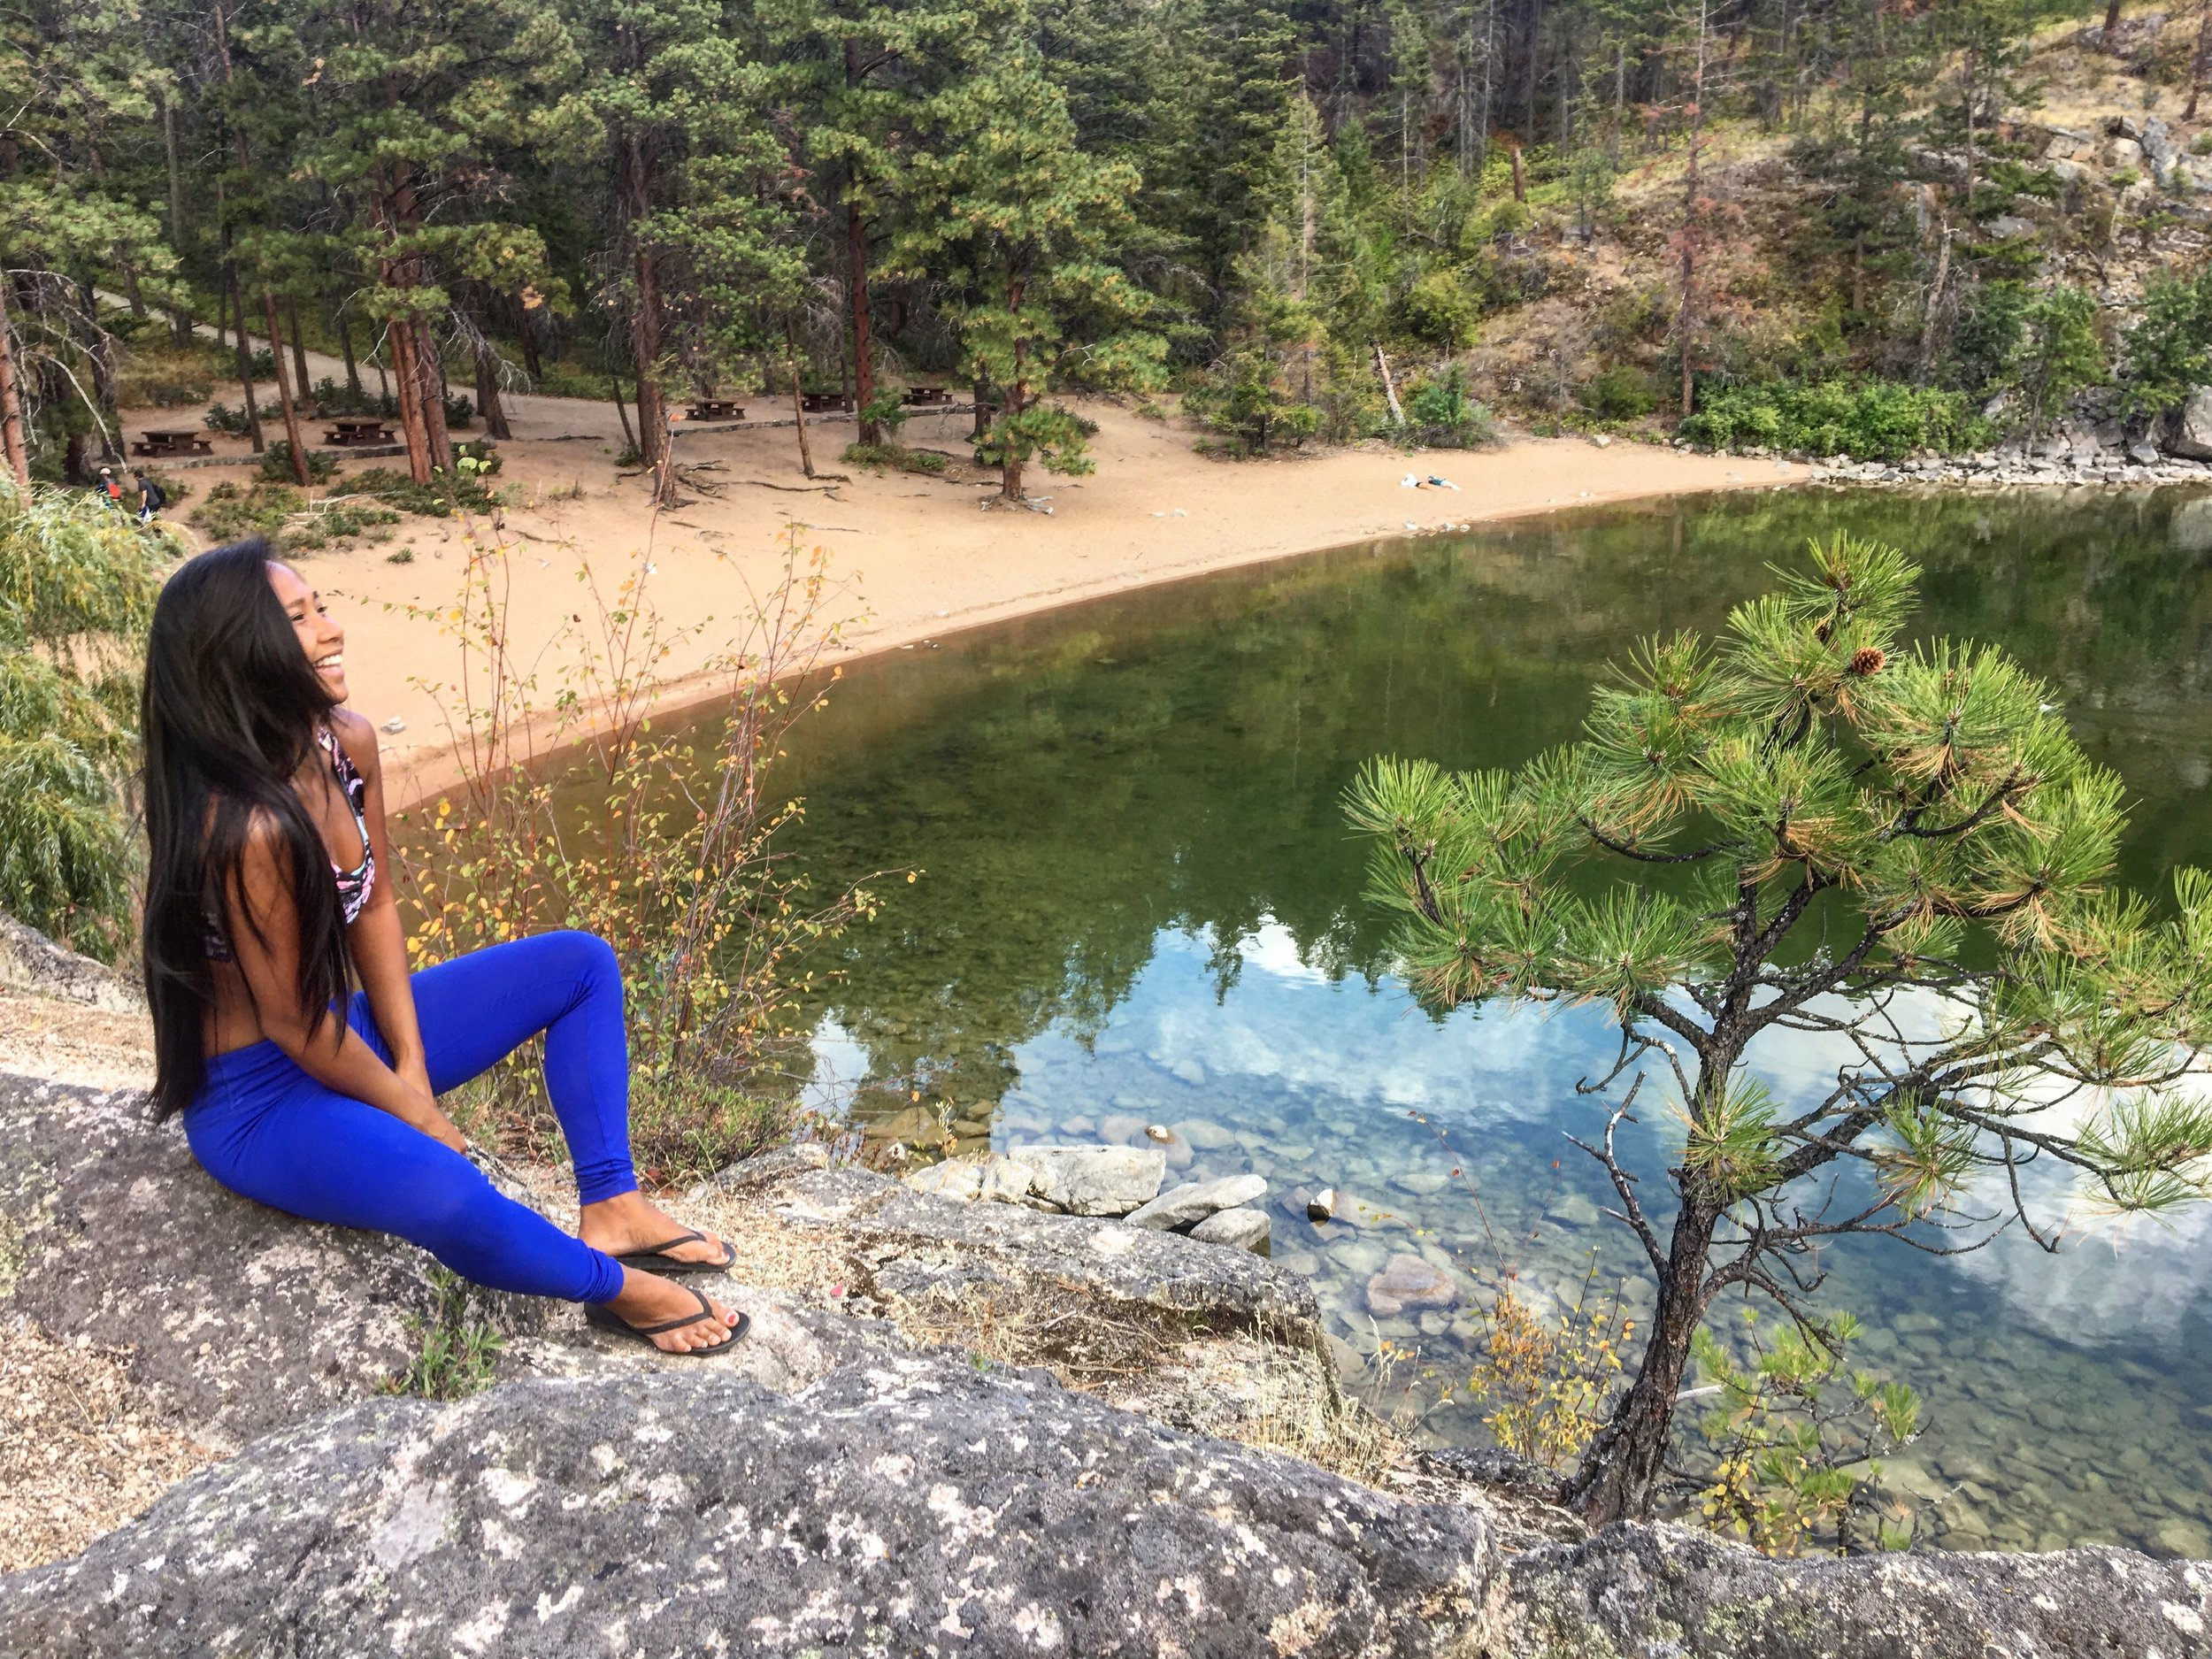 Ellison-provincial-park-okanagan-british-columbia-canada.jpg